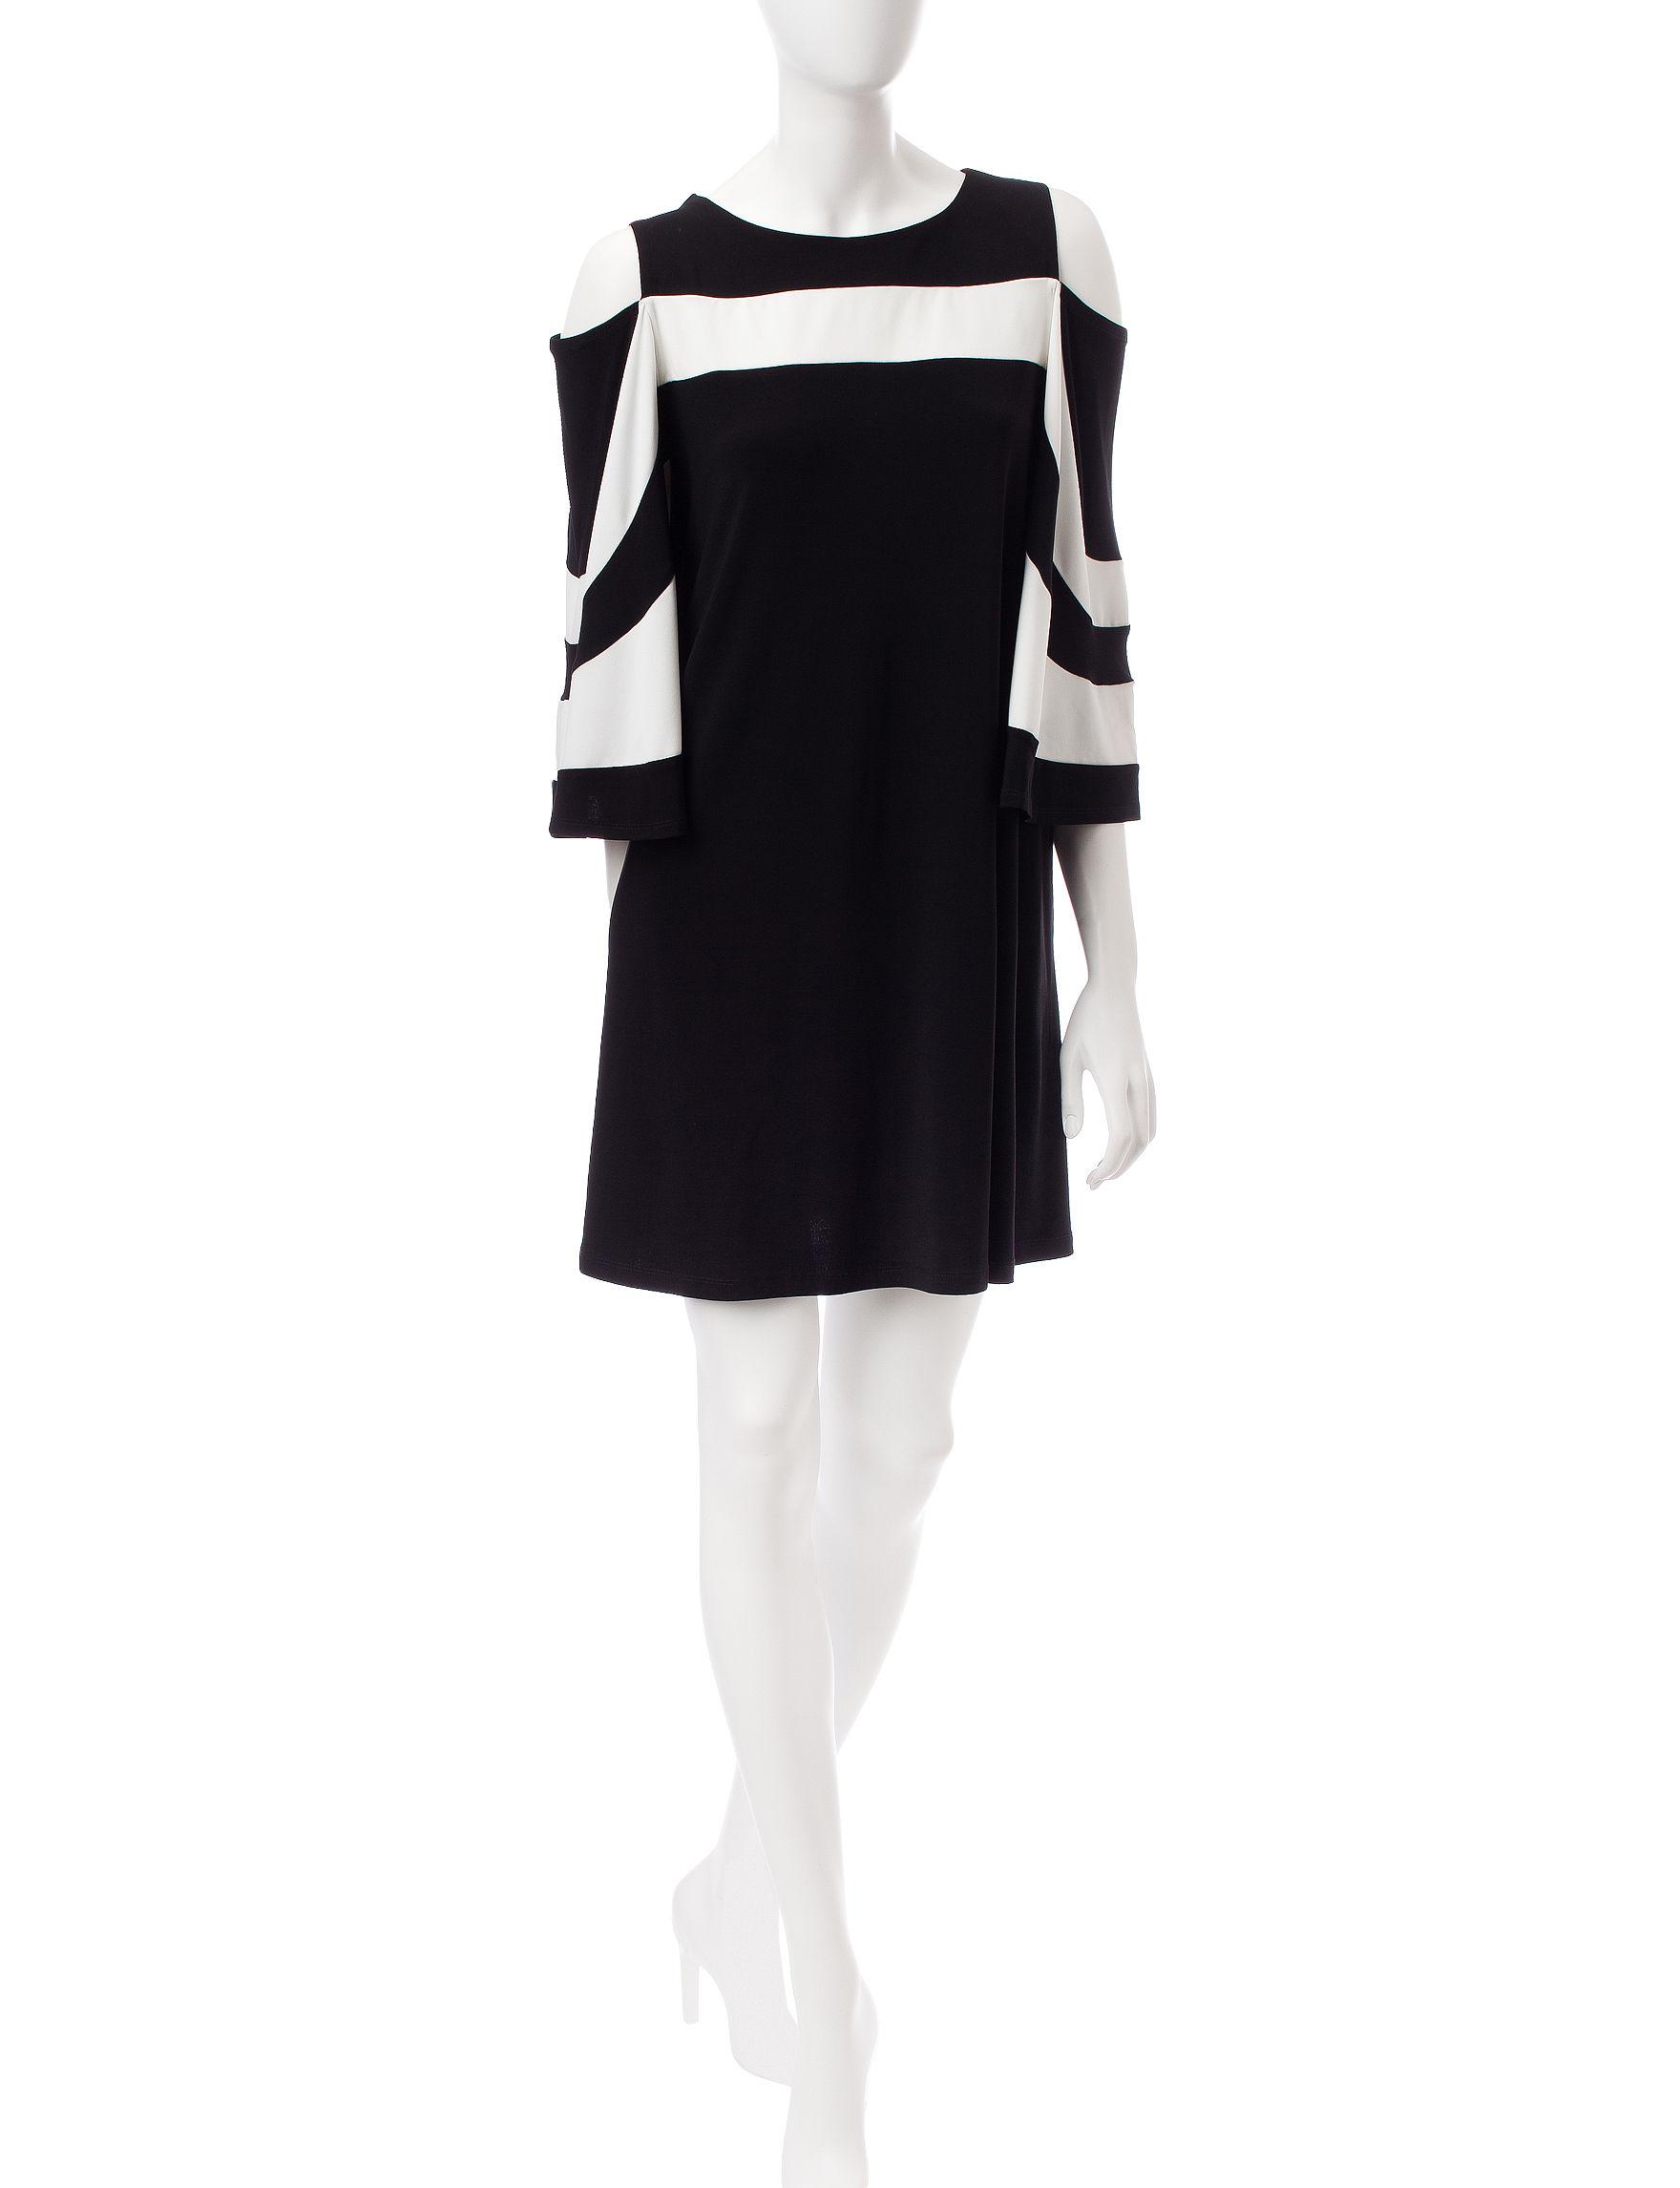 Lennie Black / Ivory Everyday & Casual Shift Dresses